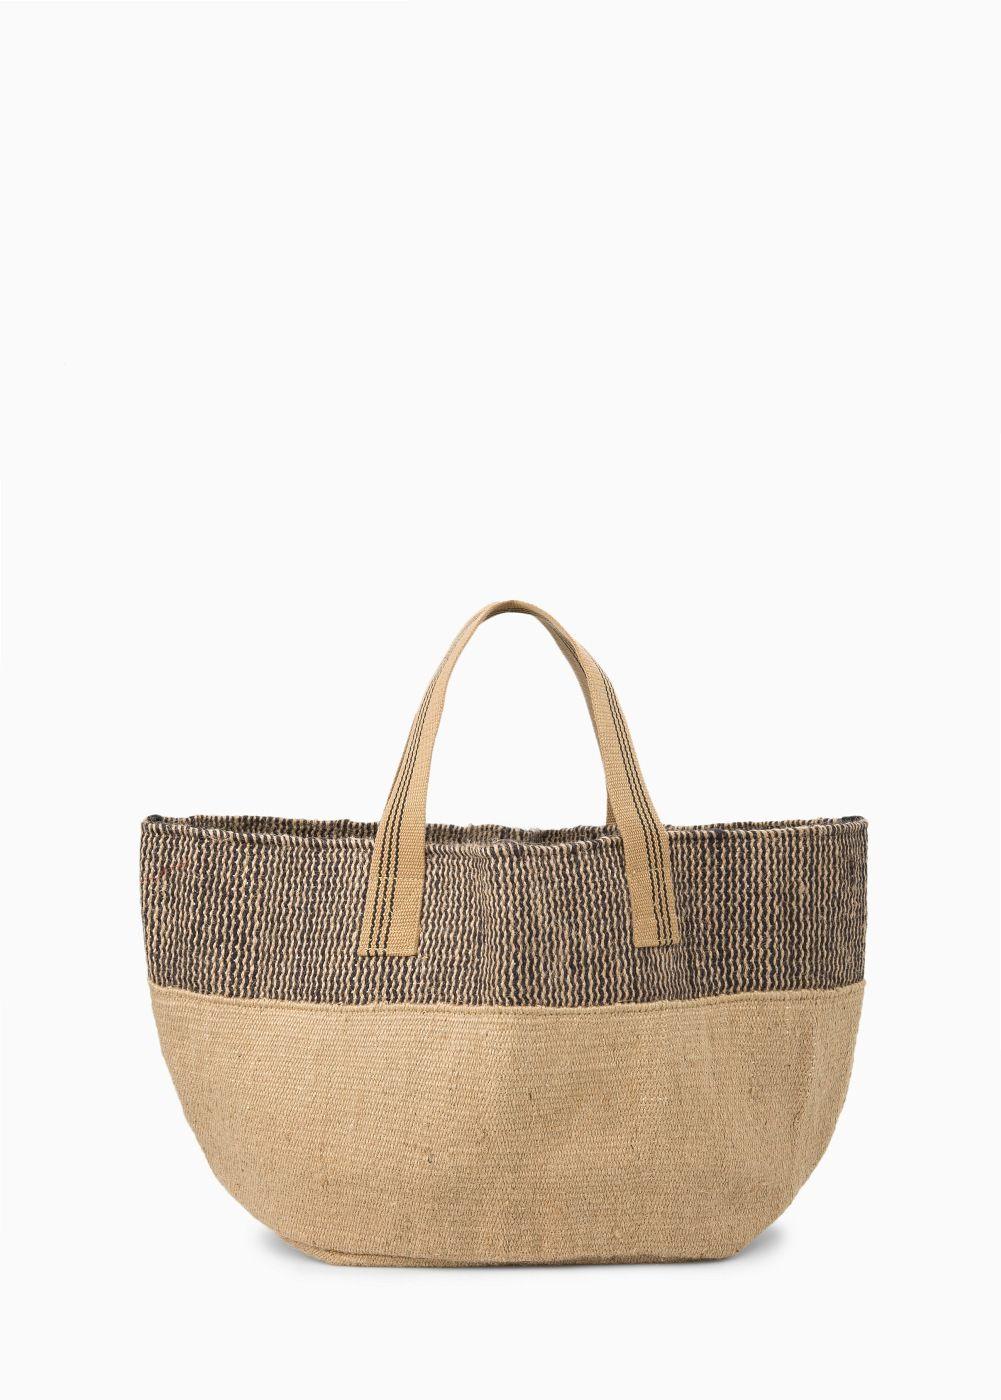 Jute bag - Women | Bag, Linen bag and Fabric bags